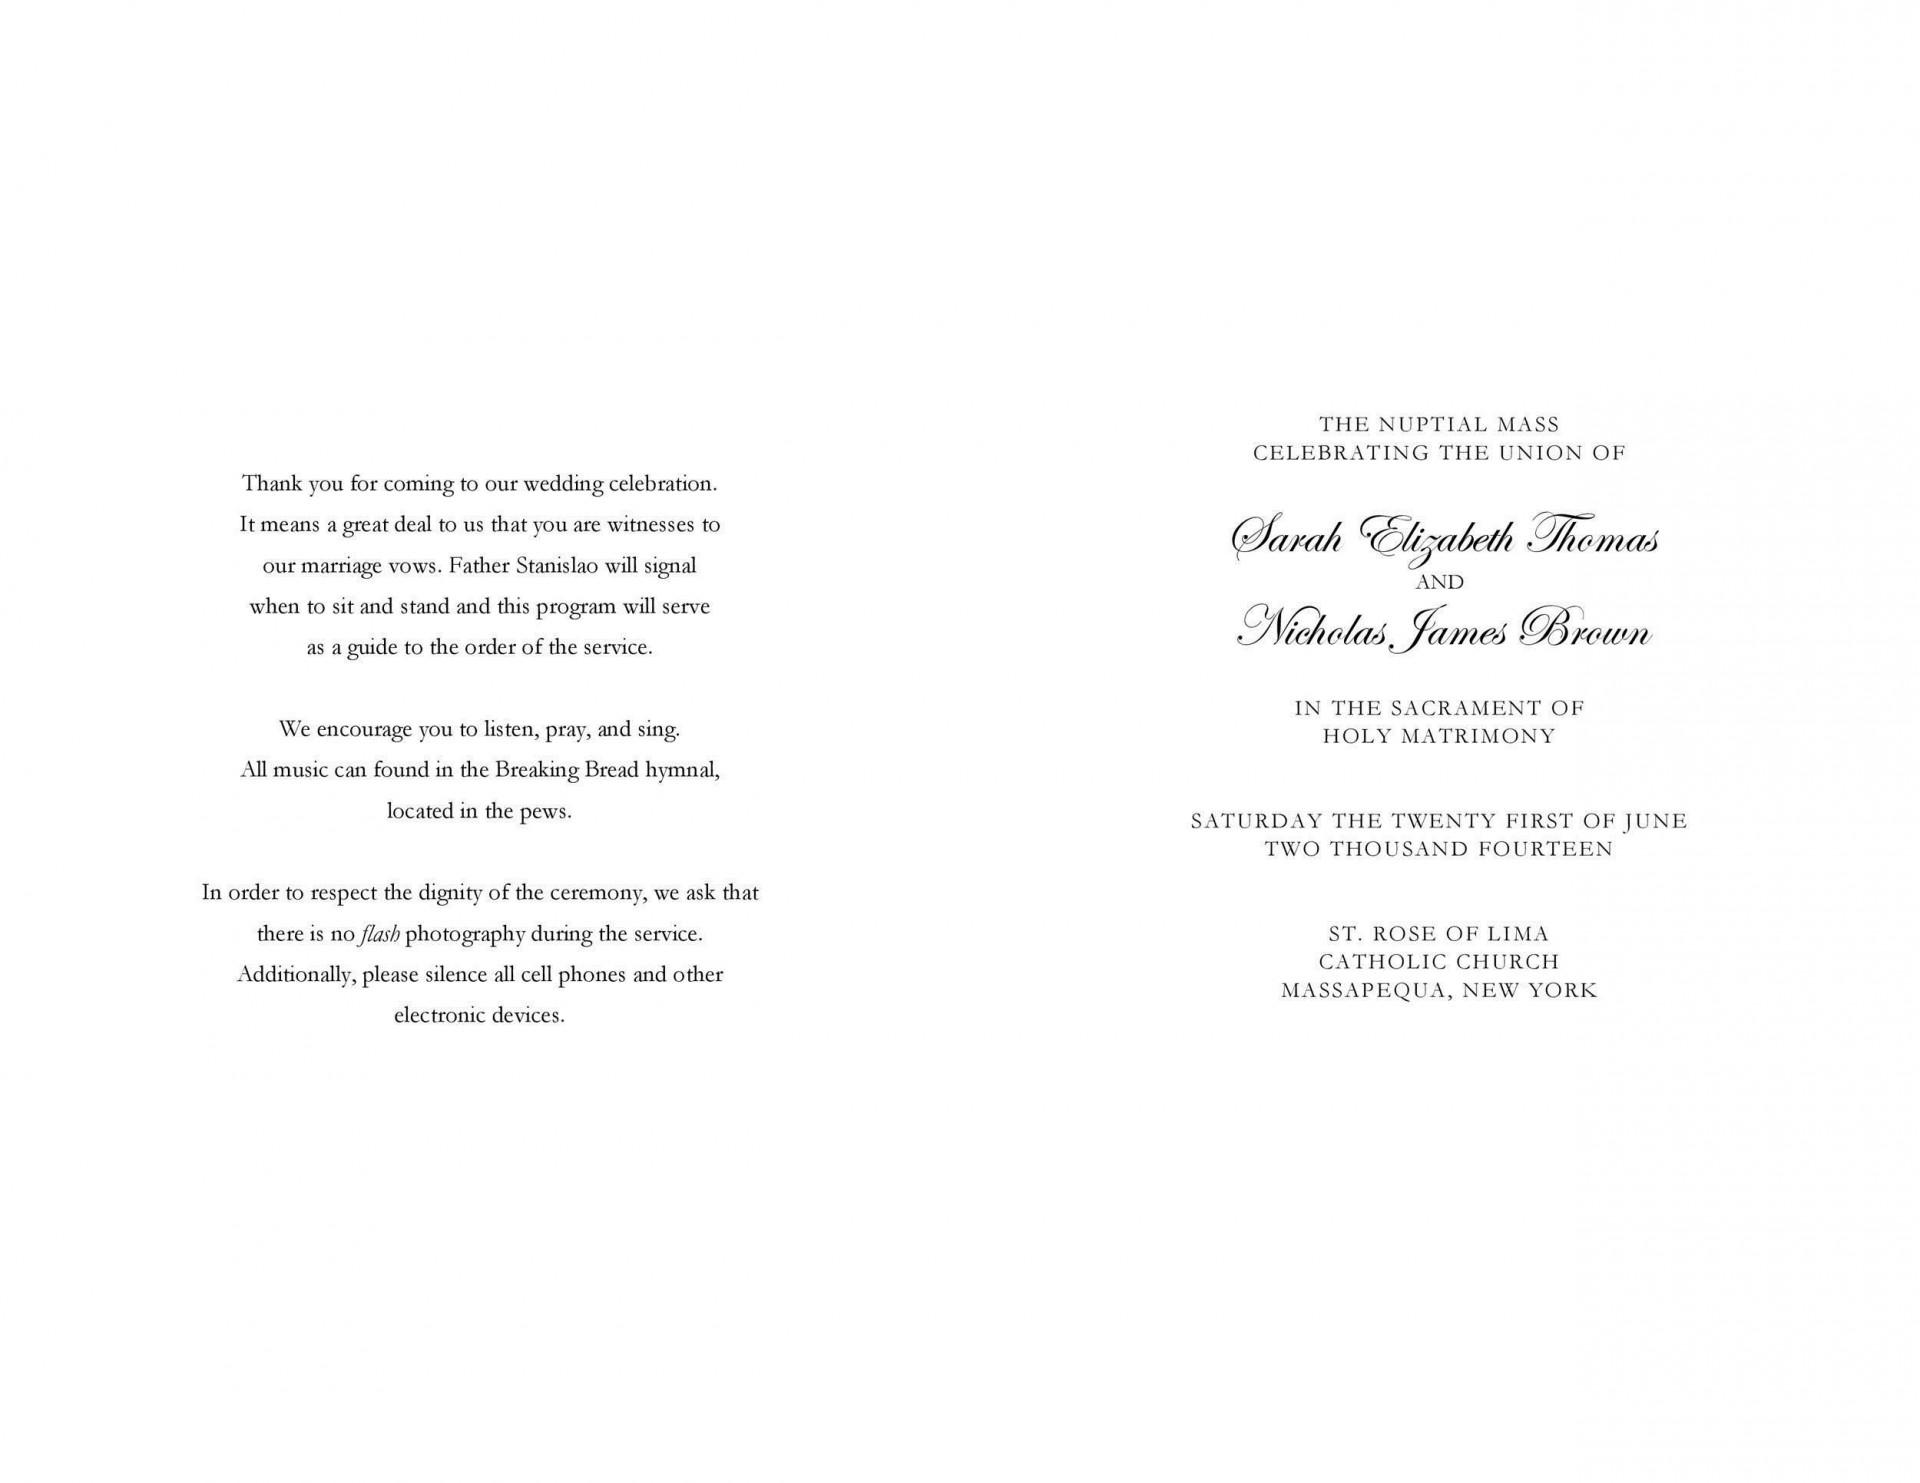 009 Rare Free Wedding Order Of Service Template Word Design  Microsoft1920